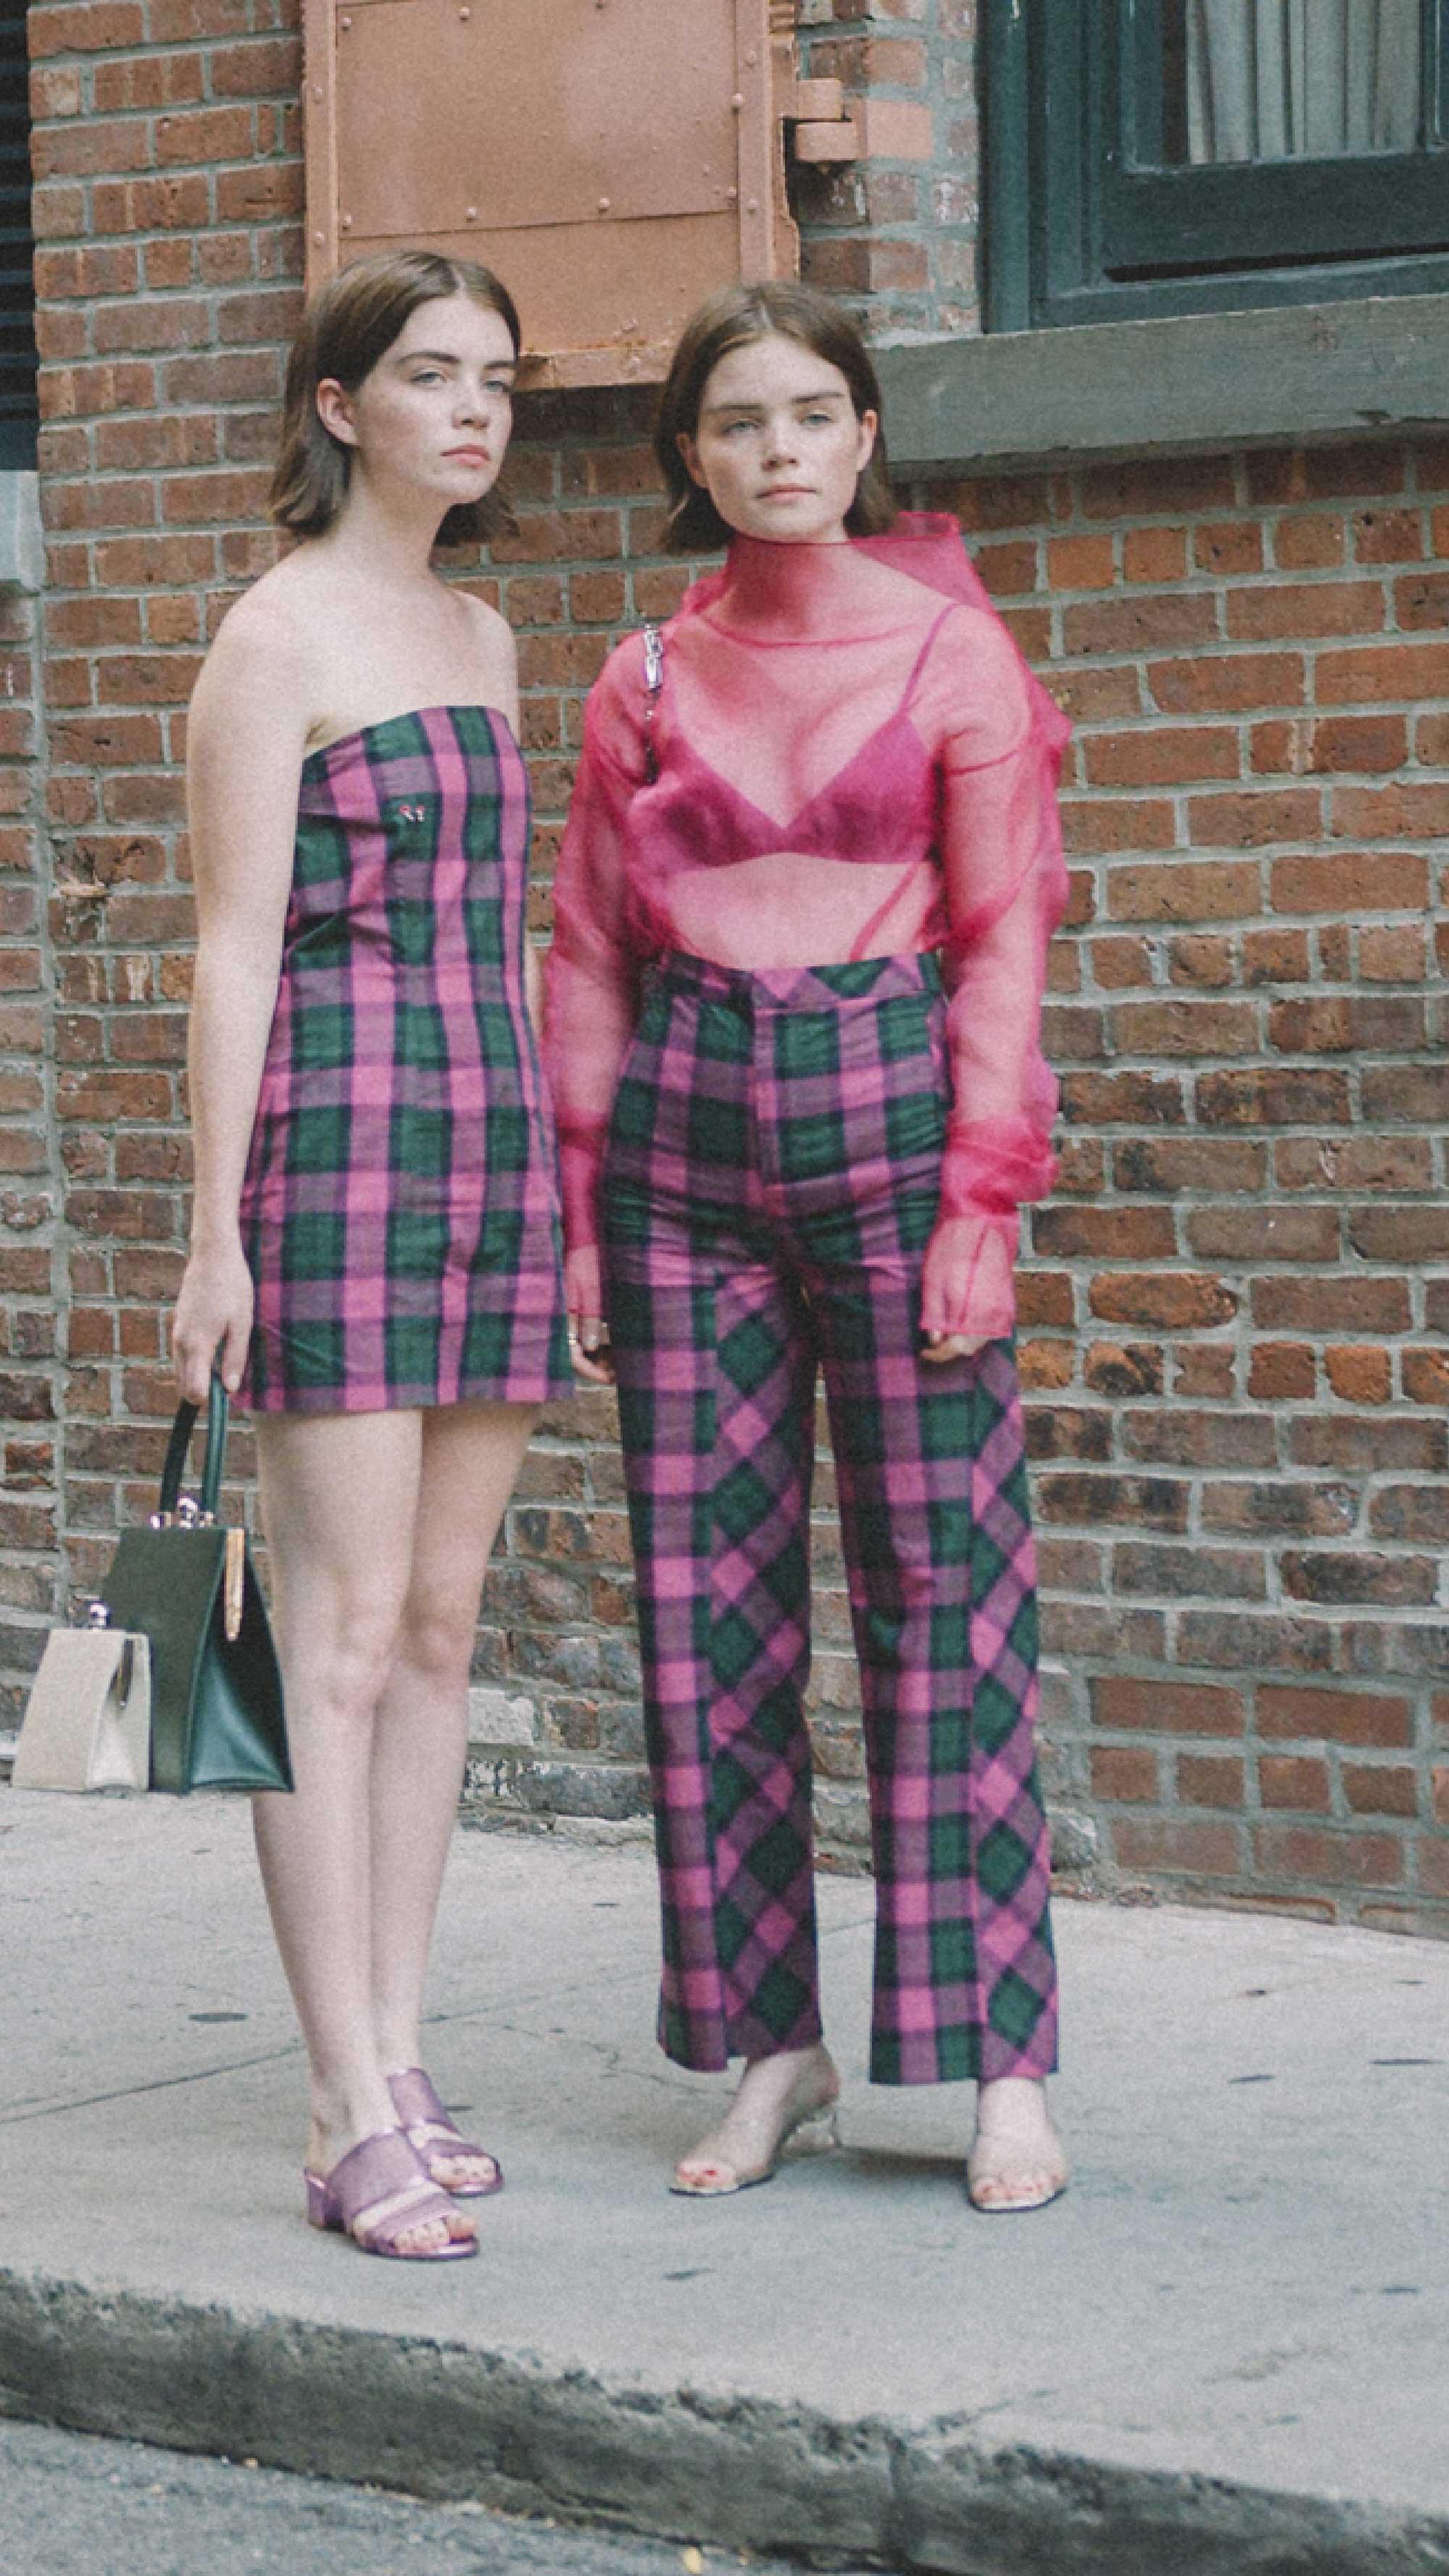 New-York-Fashion-Week-NYFW-SS18-street-style-day-one10.jpg